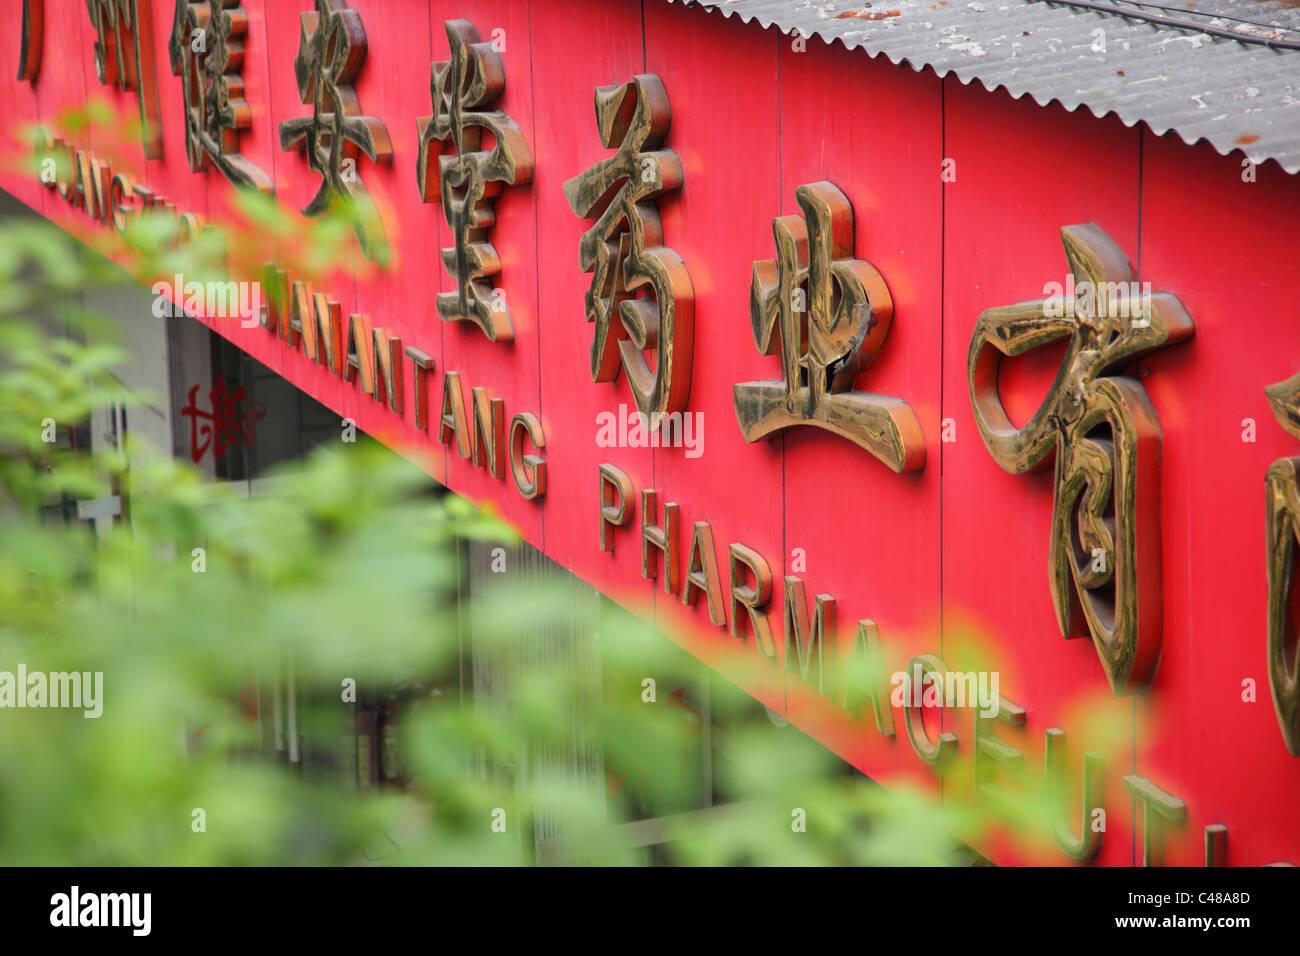 Mercado de la medicina, Guangzhou, China Imagen De Stock